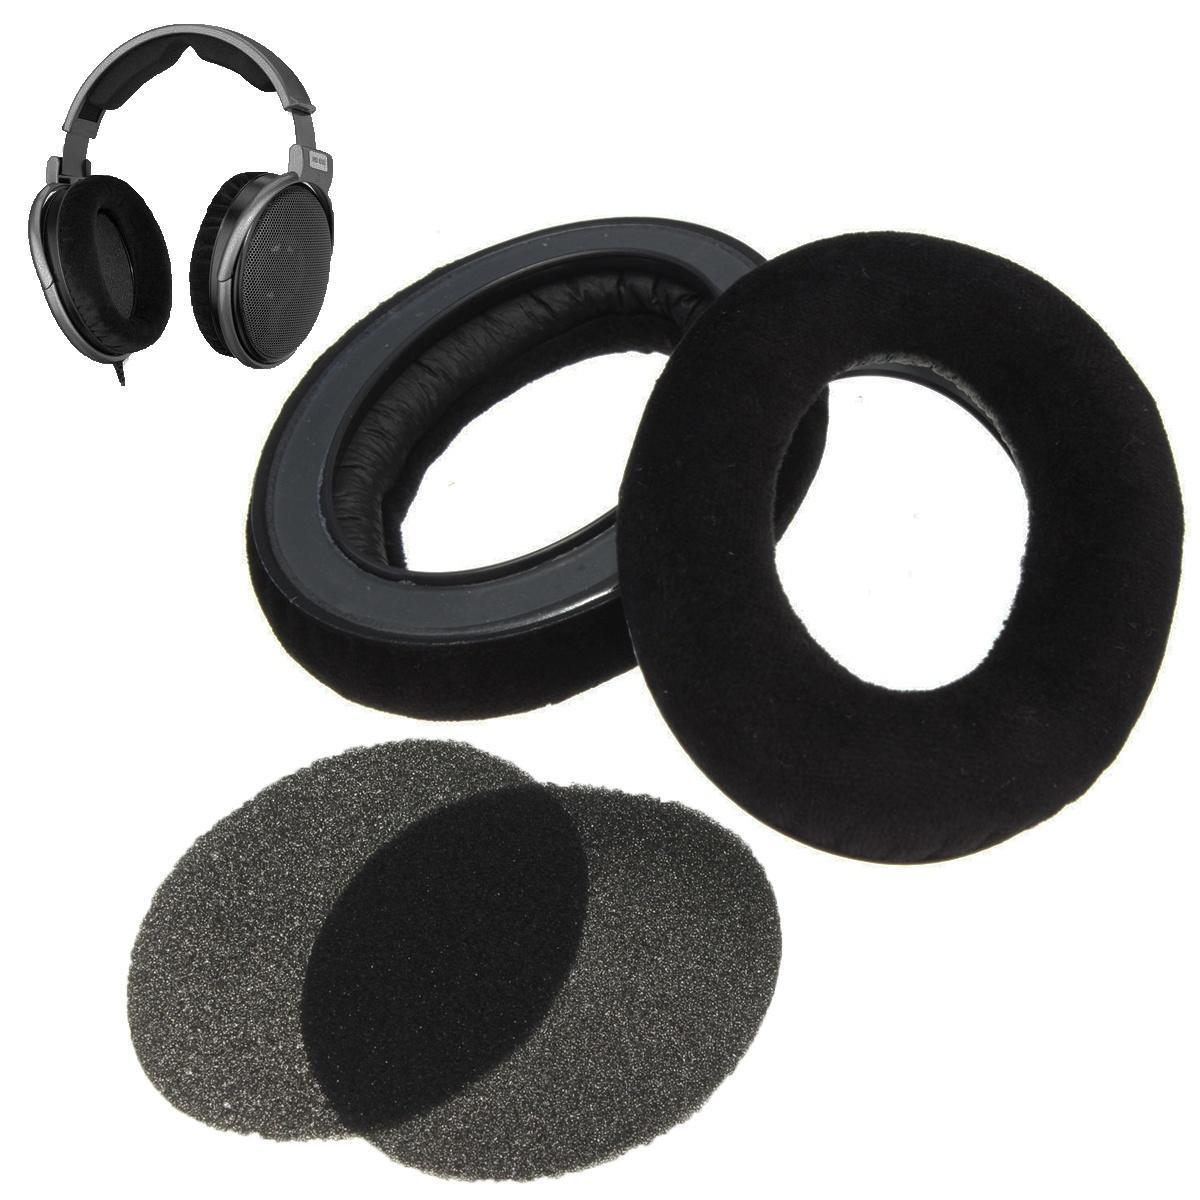 Замена амбушюры с чашки уха для Sennheiser HD545 HD565 HD580 HD600 HD650 наушников кабель publicity hd580 hd600 hd650